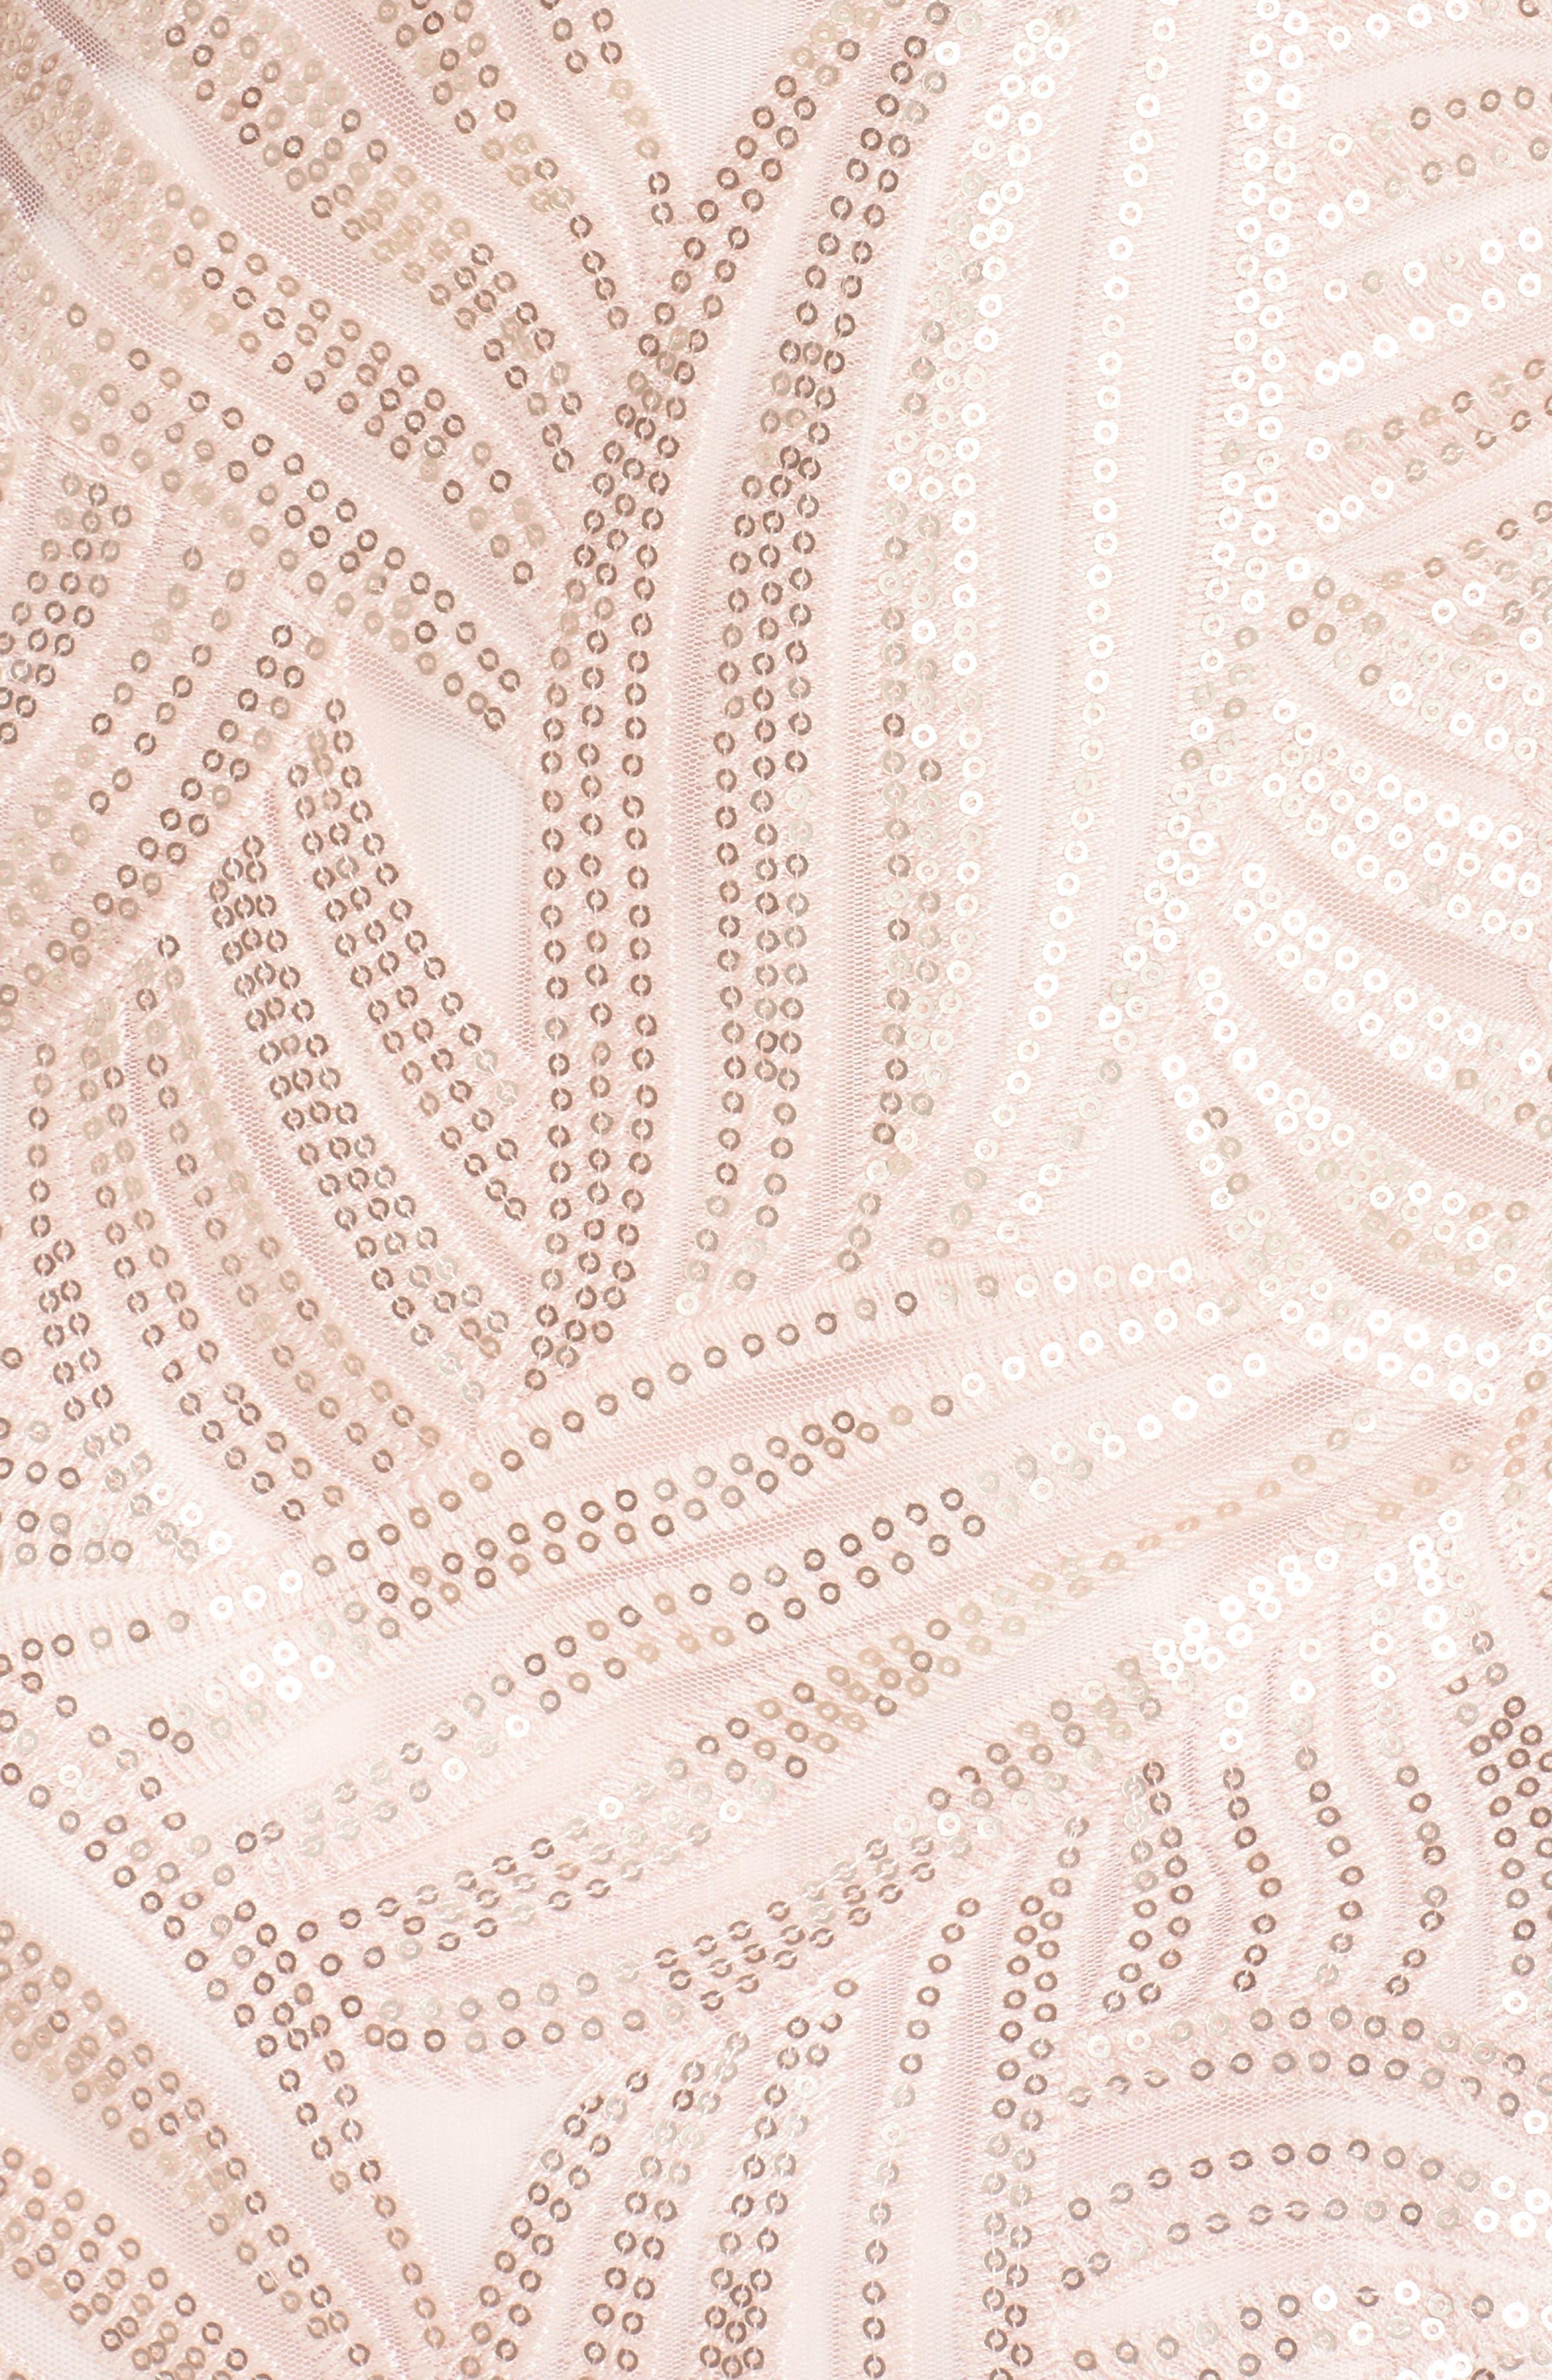 Sleeveless Sequin Sheath Dress,                             Alternate thumbnail 5, color,                             680